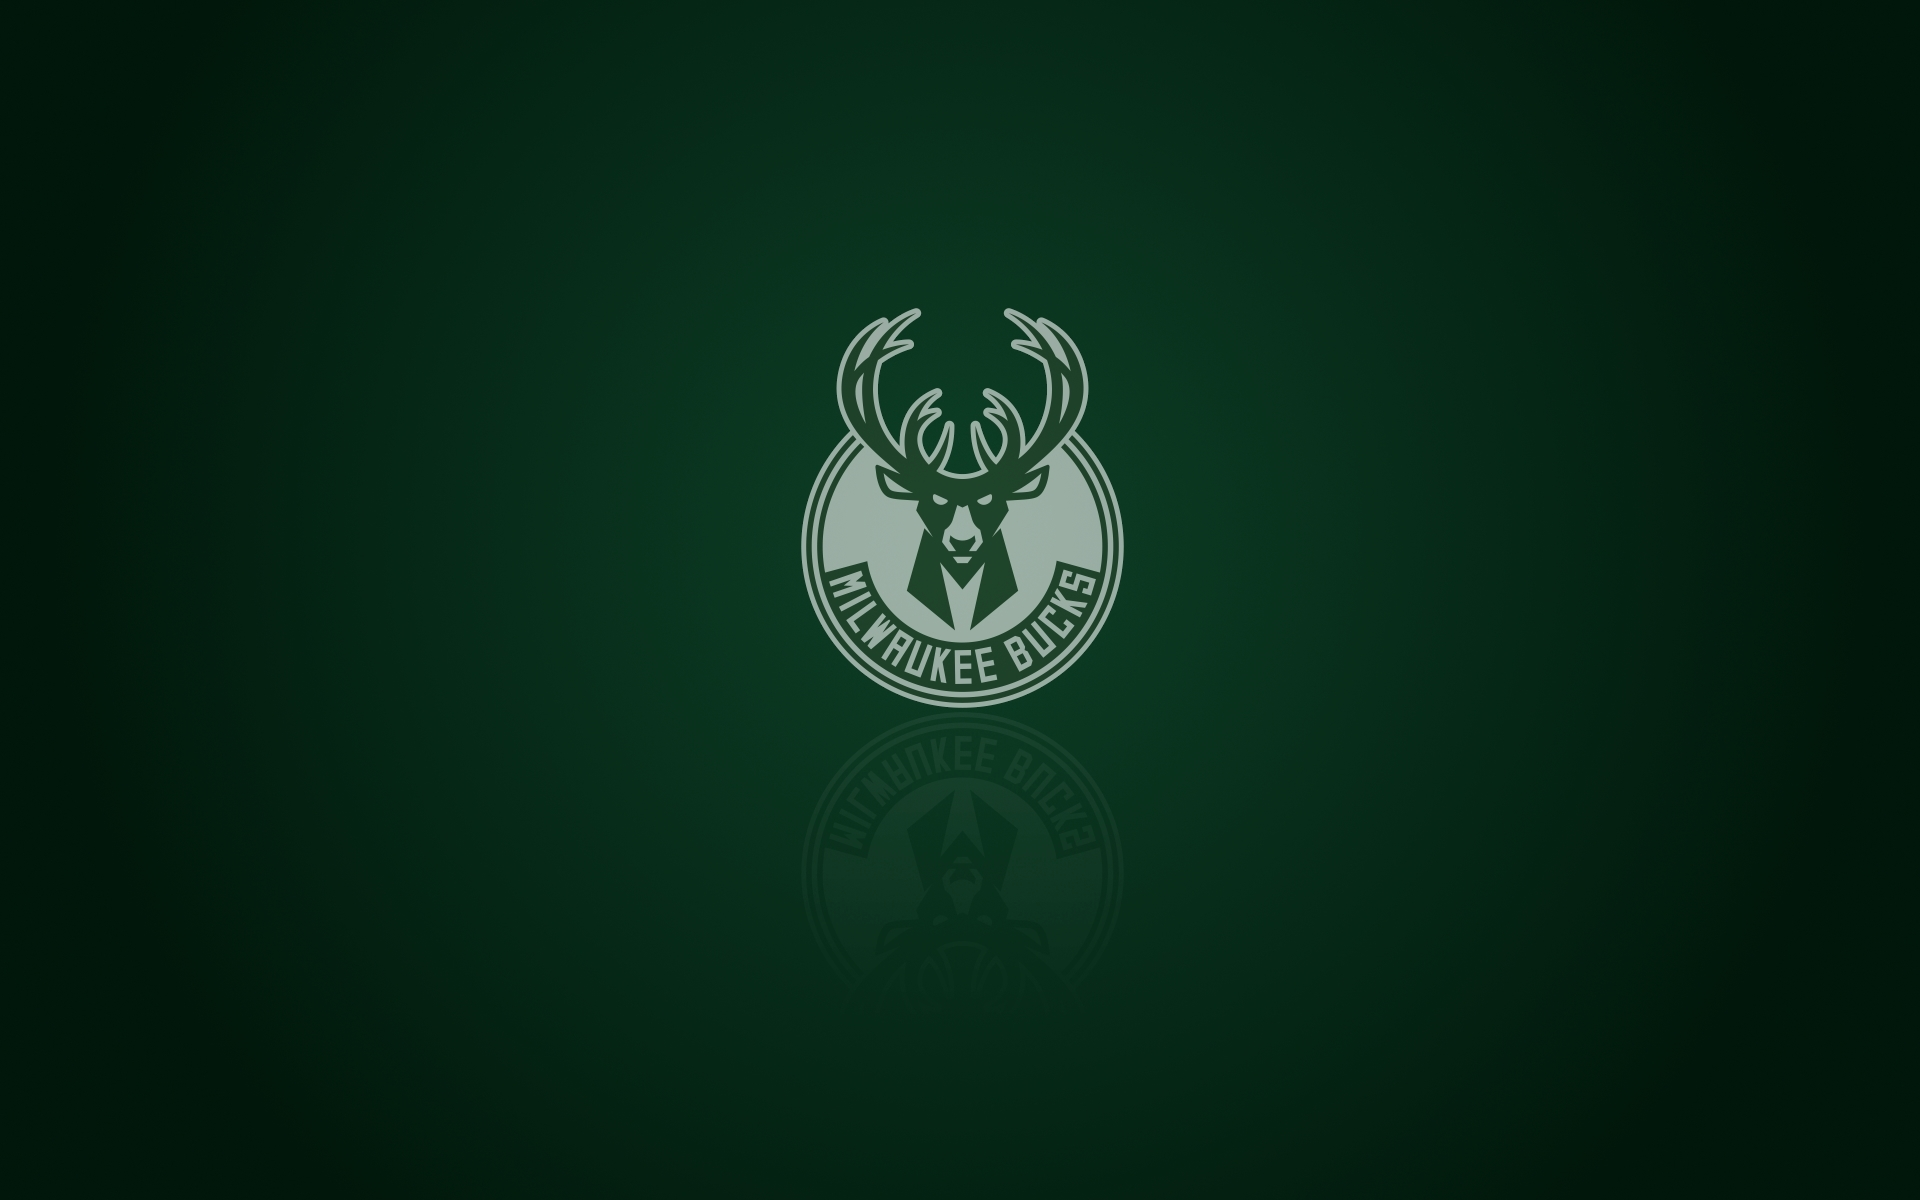 Milwaukee Bucks Wallpaper With Logo